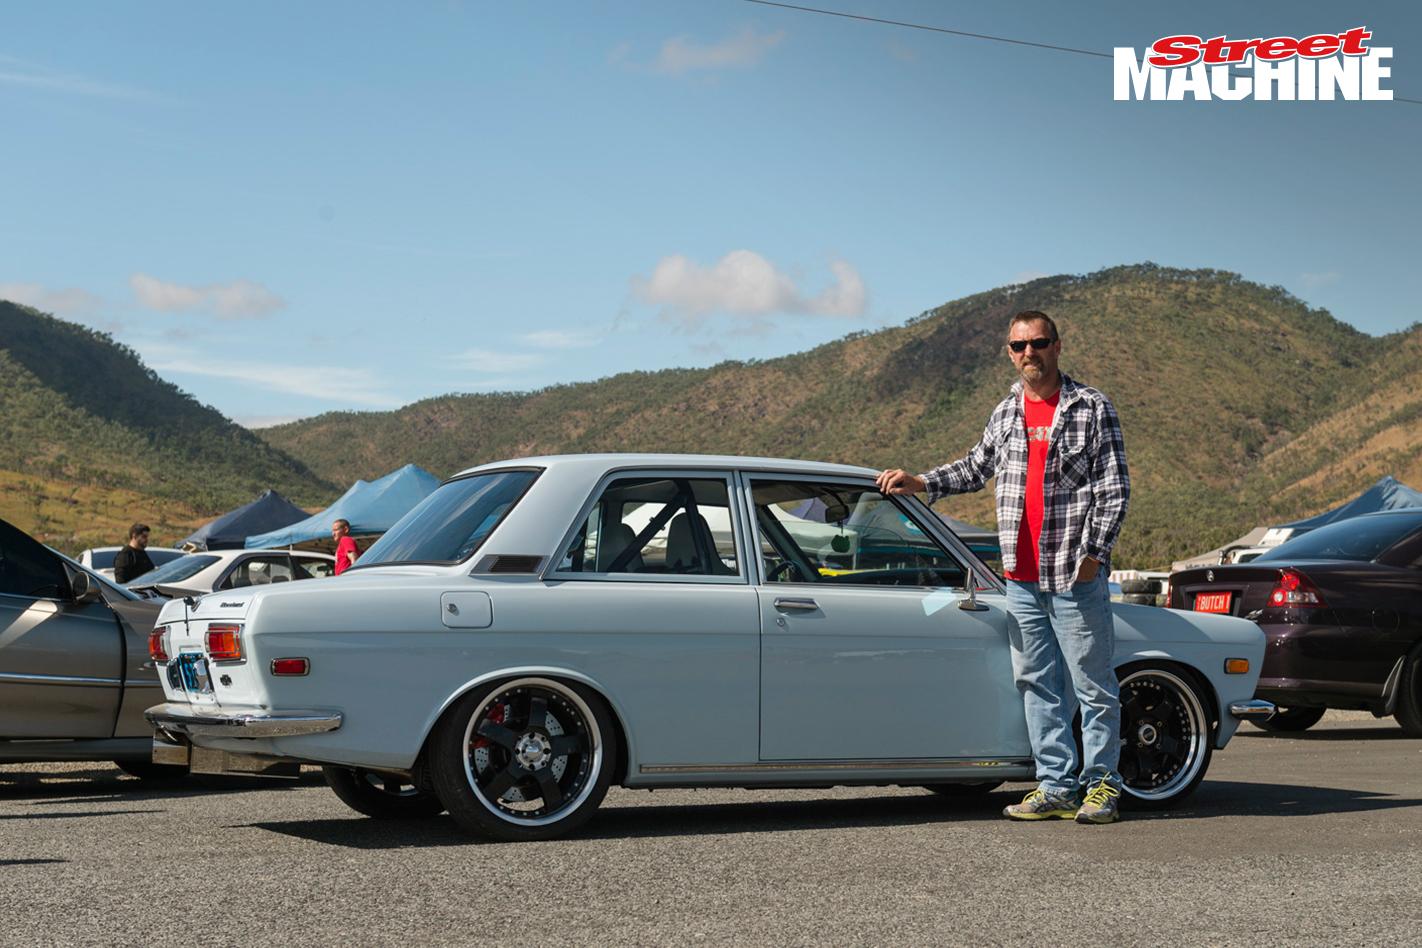 Datsun 510 Turbo SR20